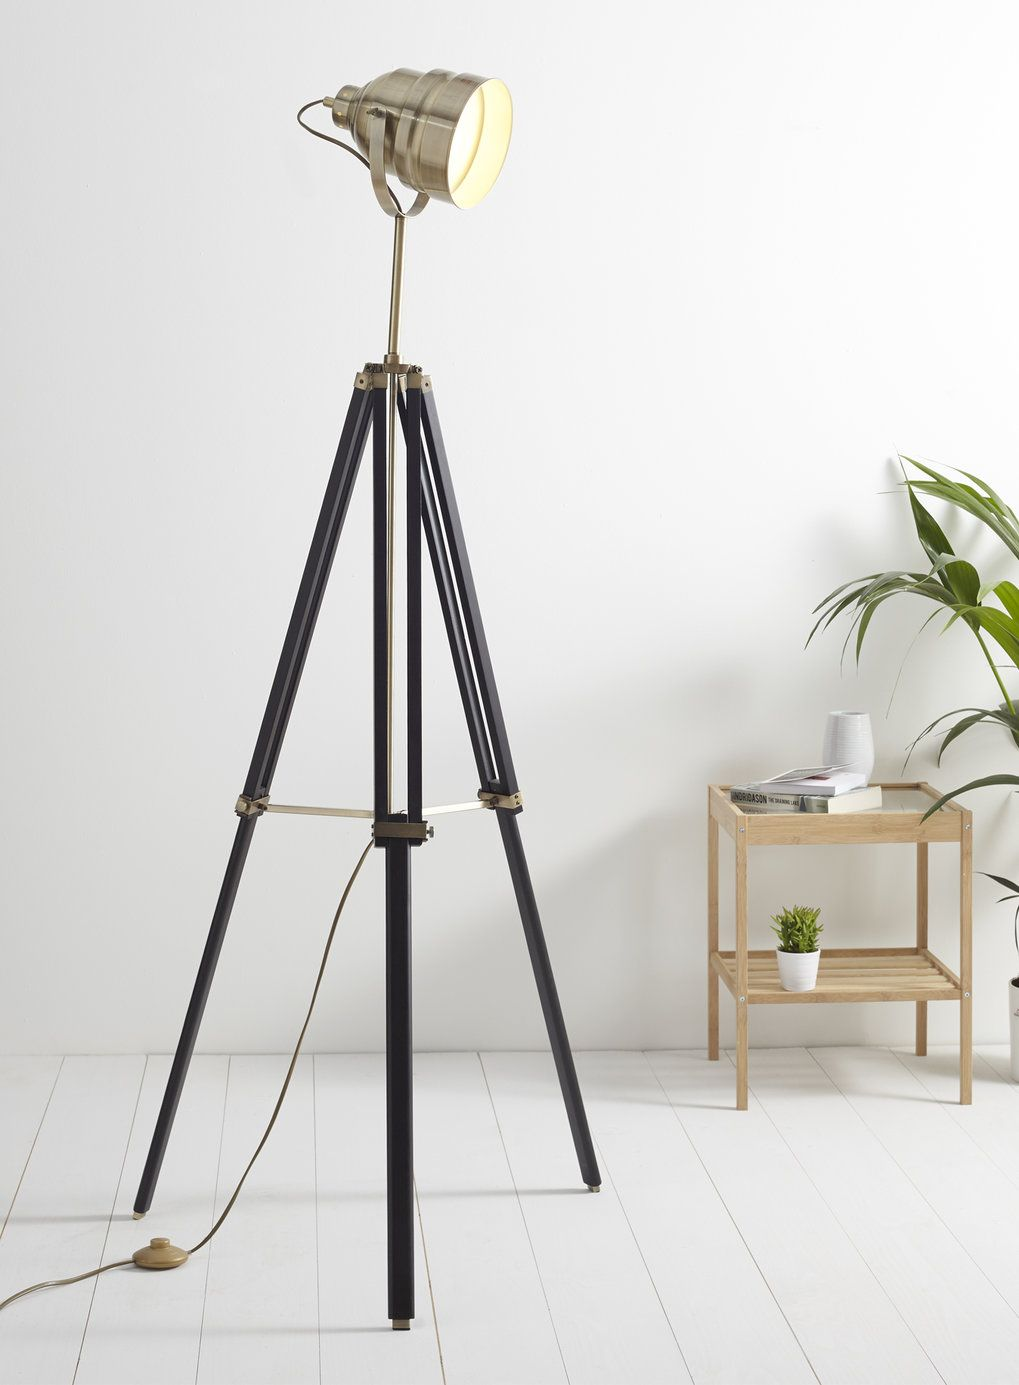 Camera Tripod Floor Lamp - BHS | 落地灯 | Pinterest | Bhs, Tripod ...